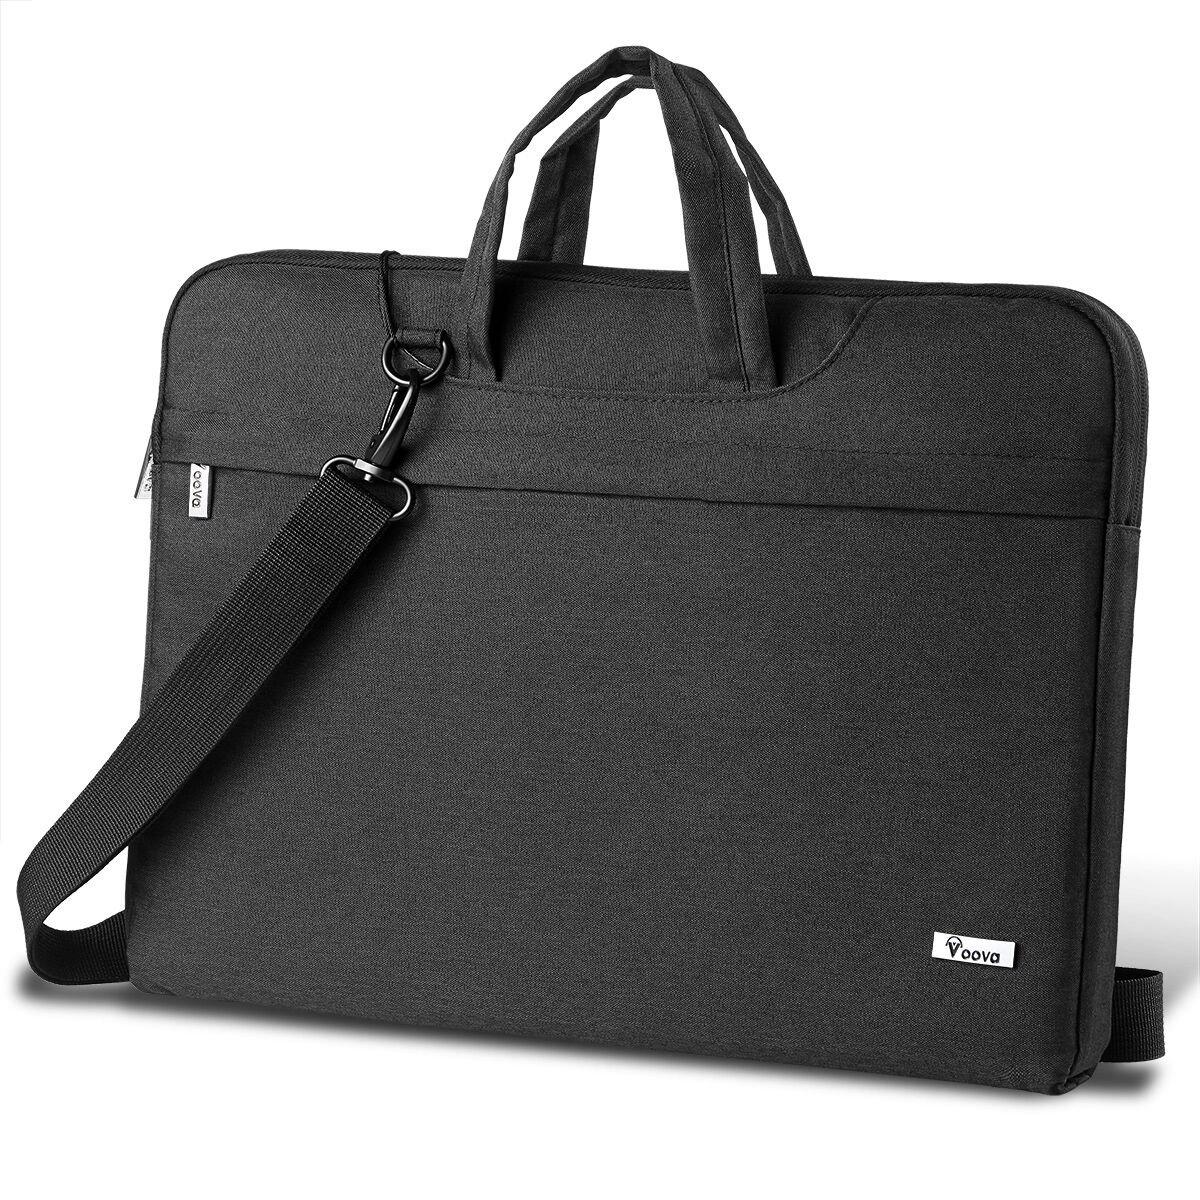 1138322767f1 Voova Laptop Bag 14-15.6Inch Water-resistant Laptop Case with Multiple  Compartment Soft Foam Laptop Sleeve Shoulder Bag Computer Case Briefcase ...